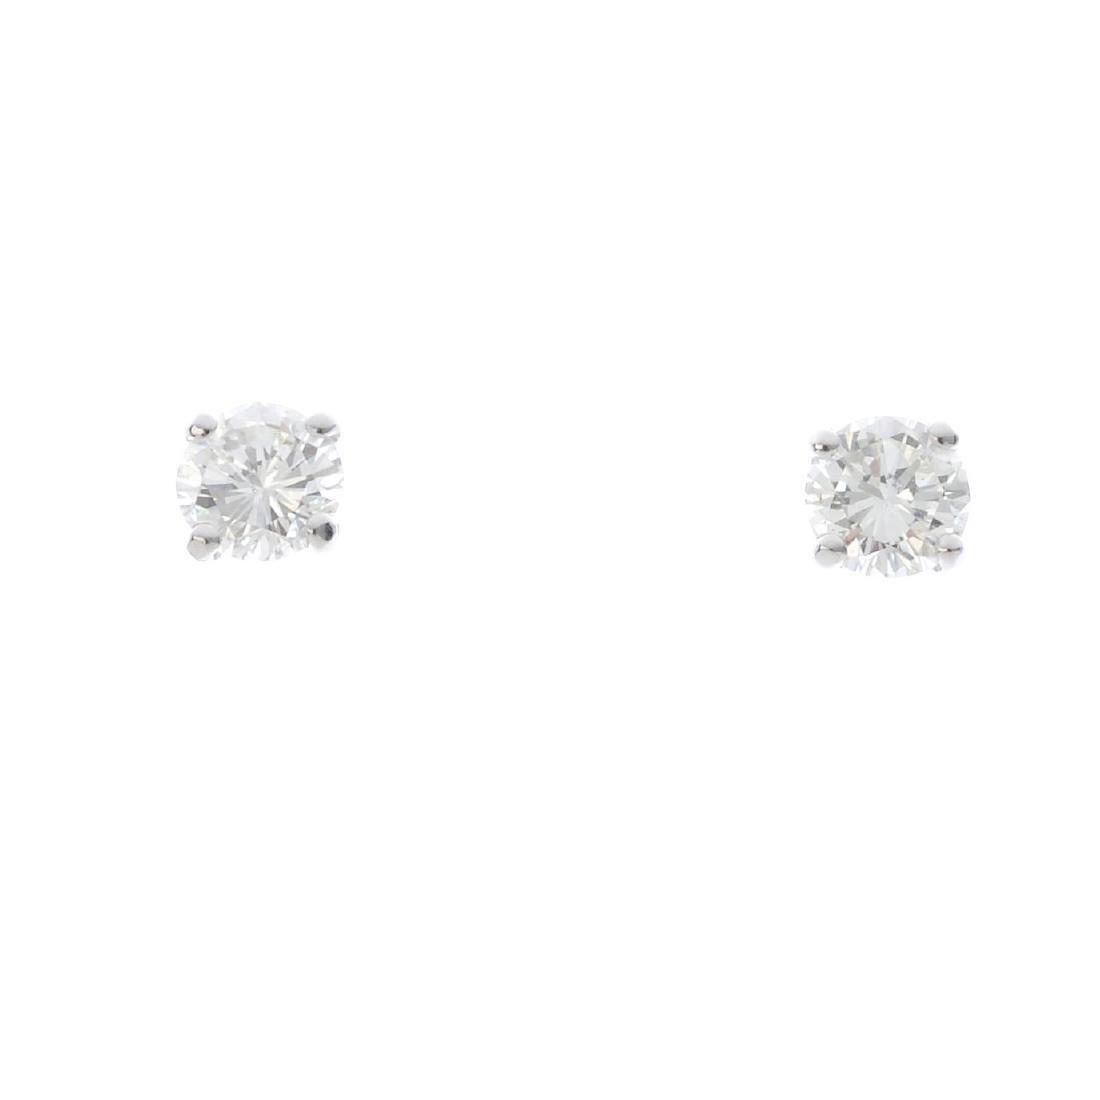 A pair of brilliant-cut diamond stud earrings. Total